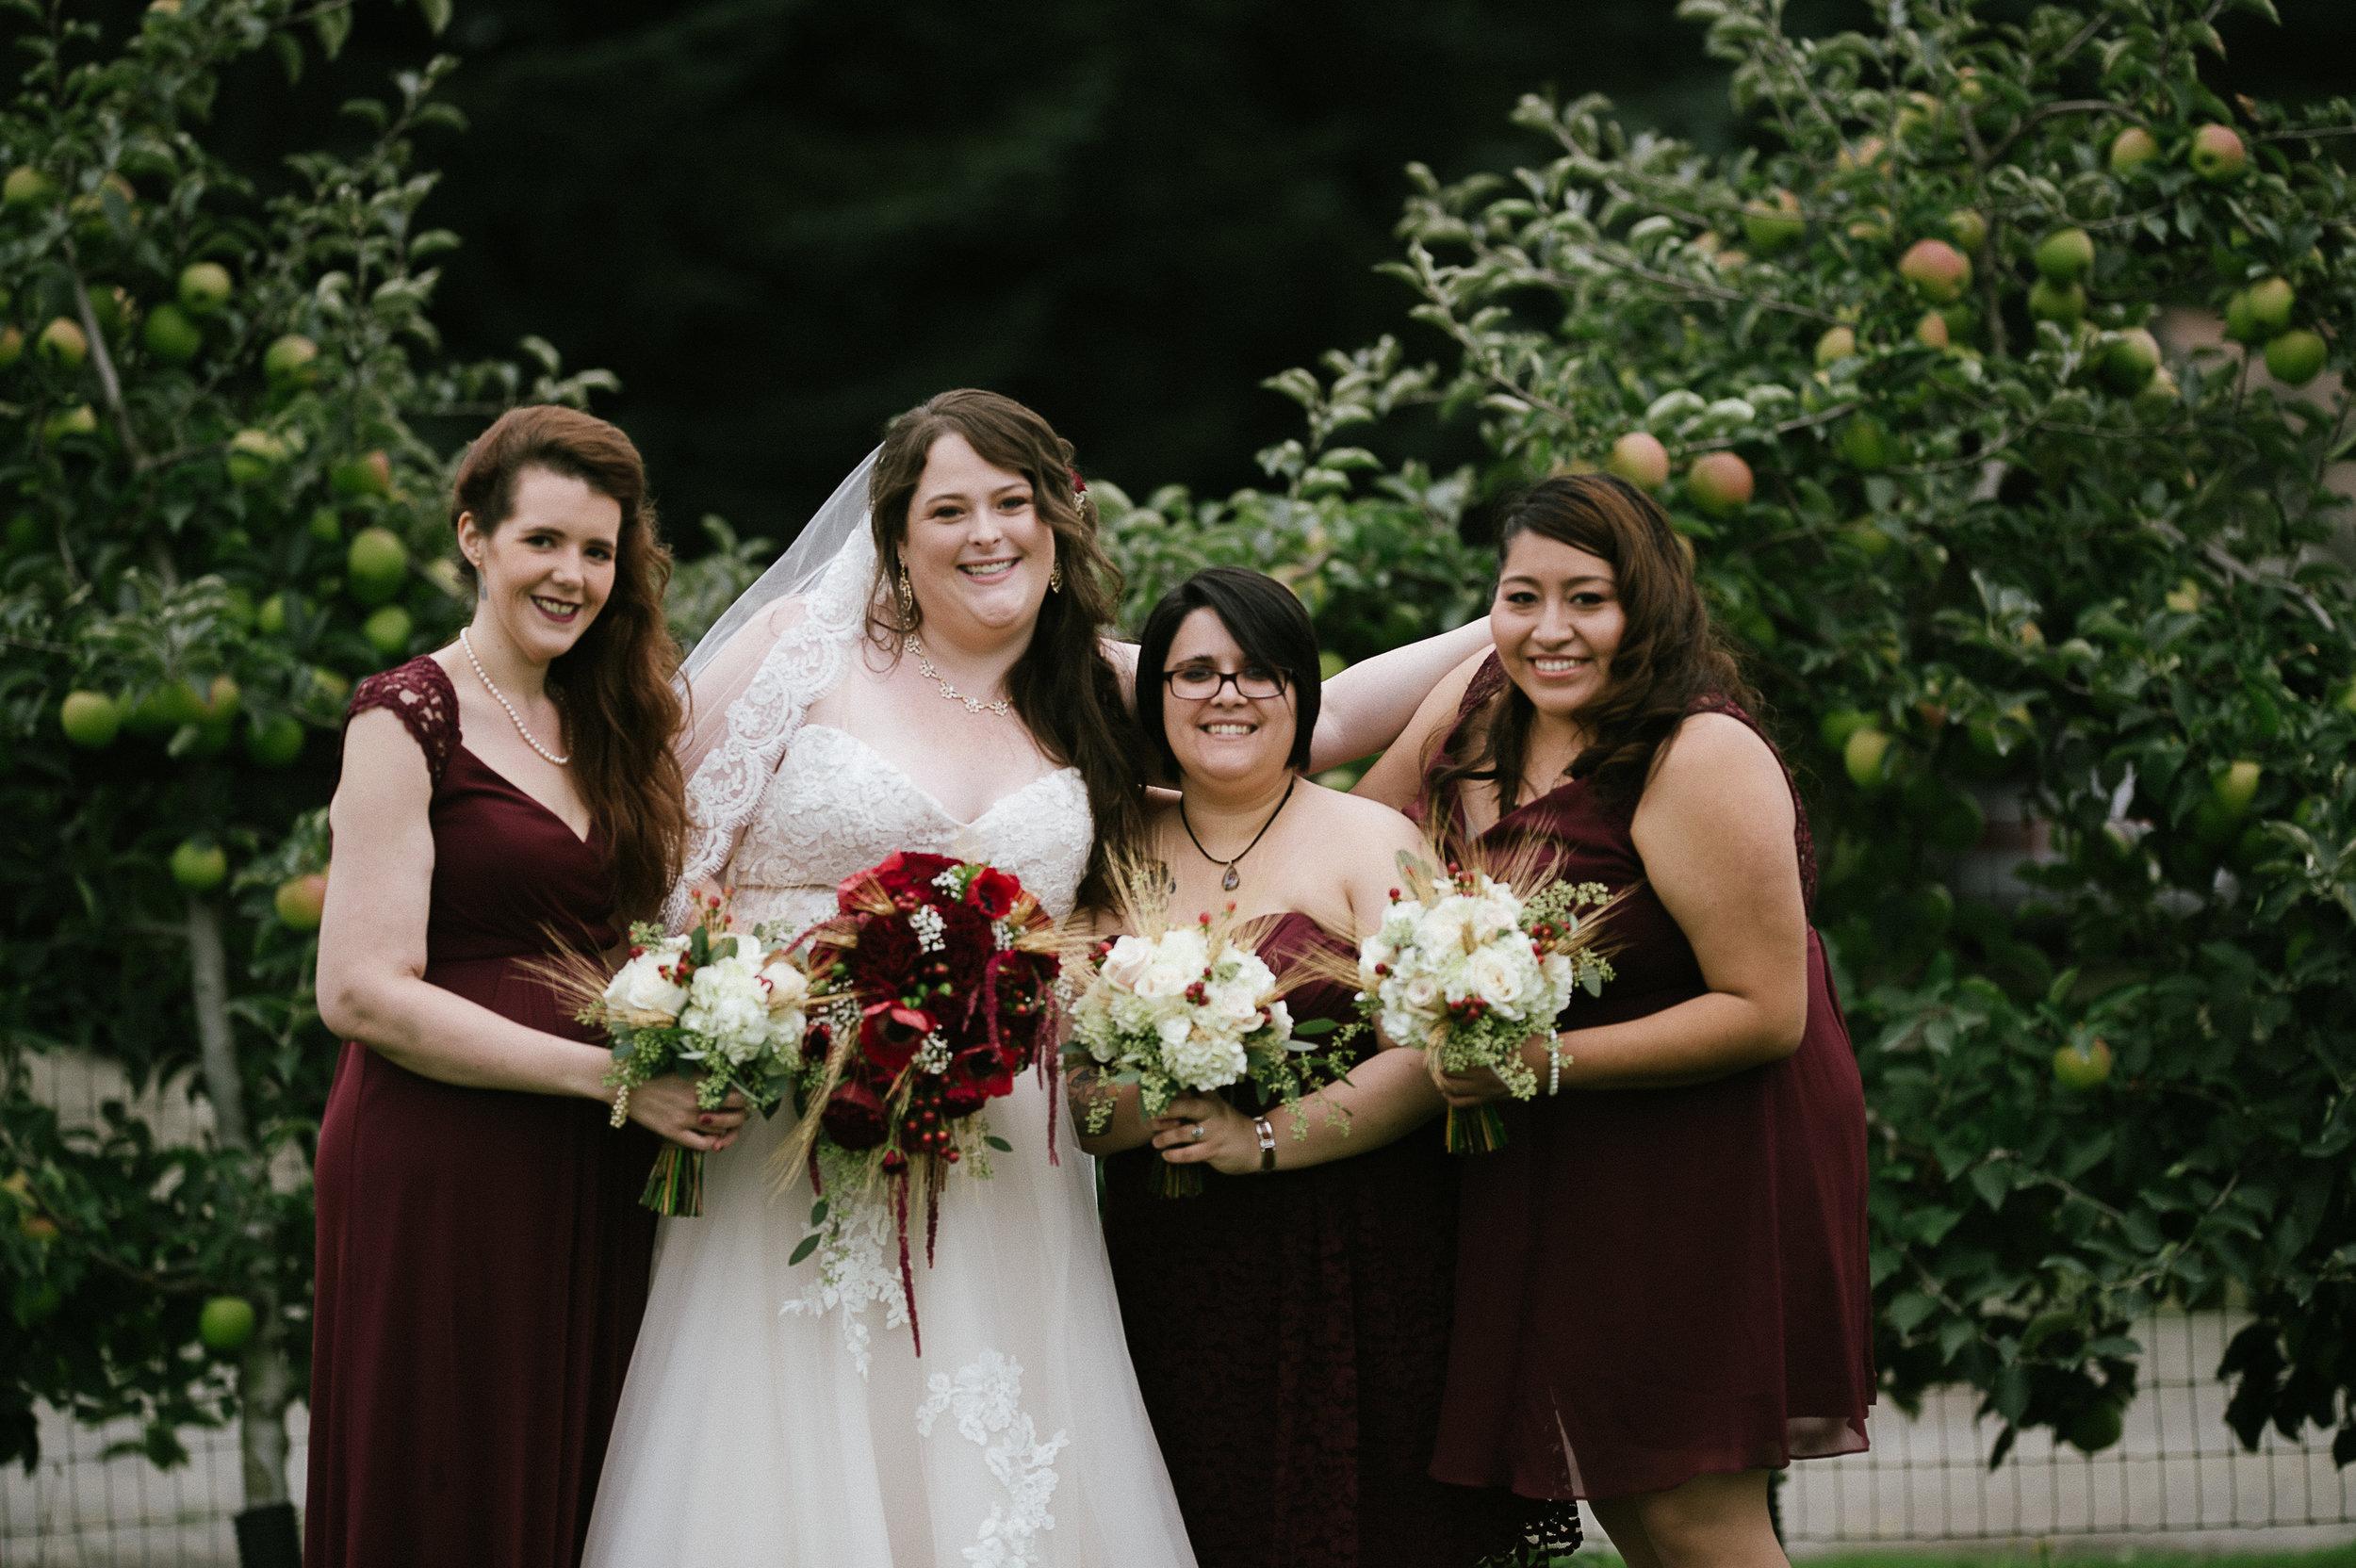 Swan Trail Farm Wedding_Sarah Schurman + Brian Skadan_Snohomish Wedding_Kelsey Lane Photography-5836.jpg